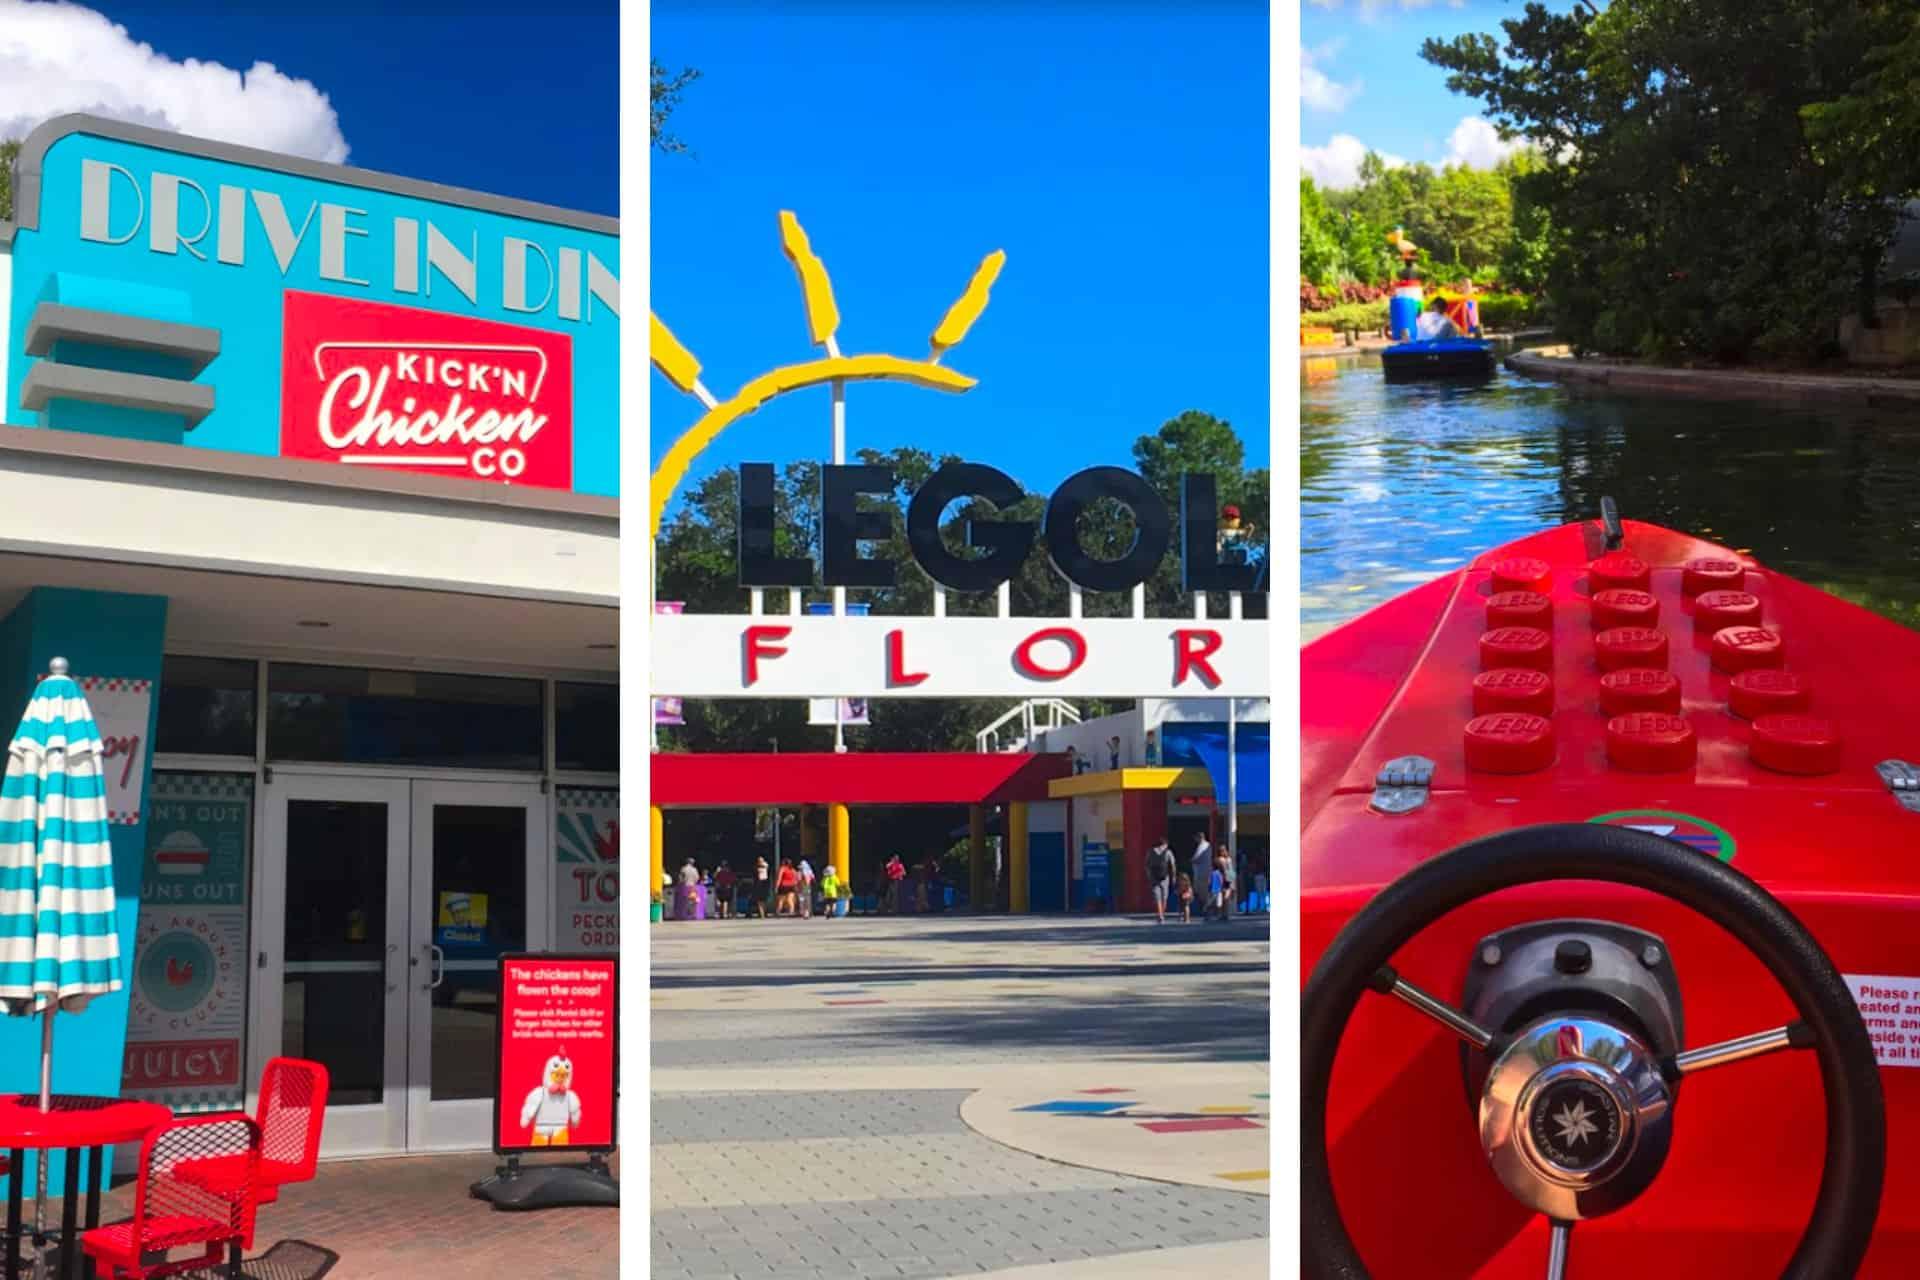 Images from Legoland Florida